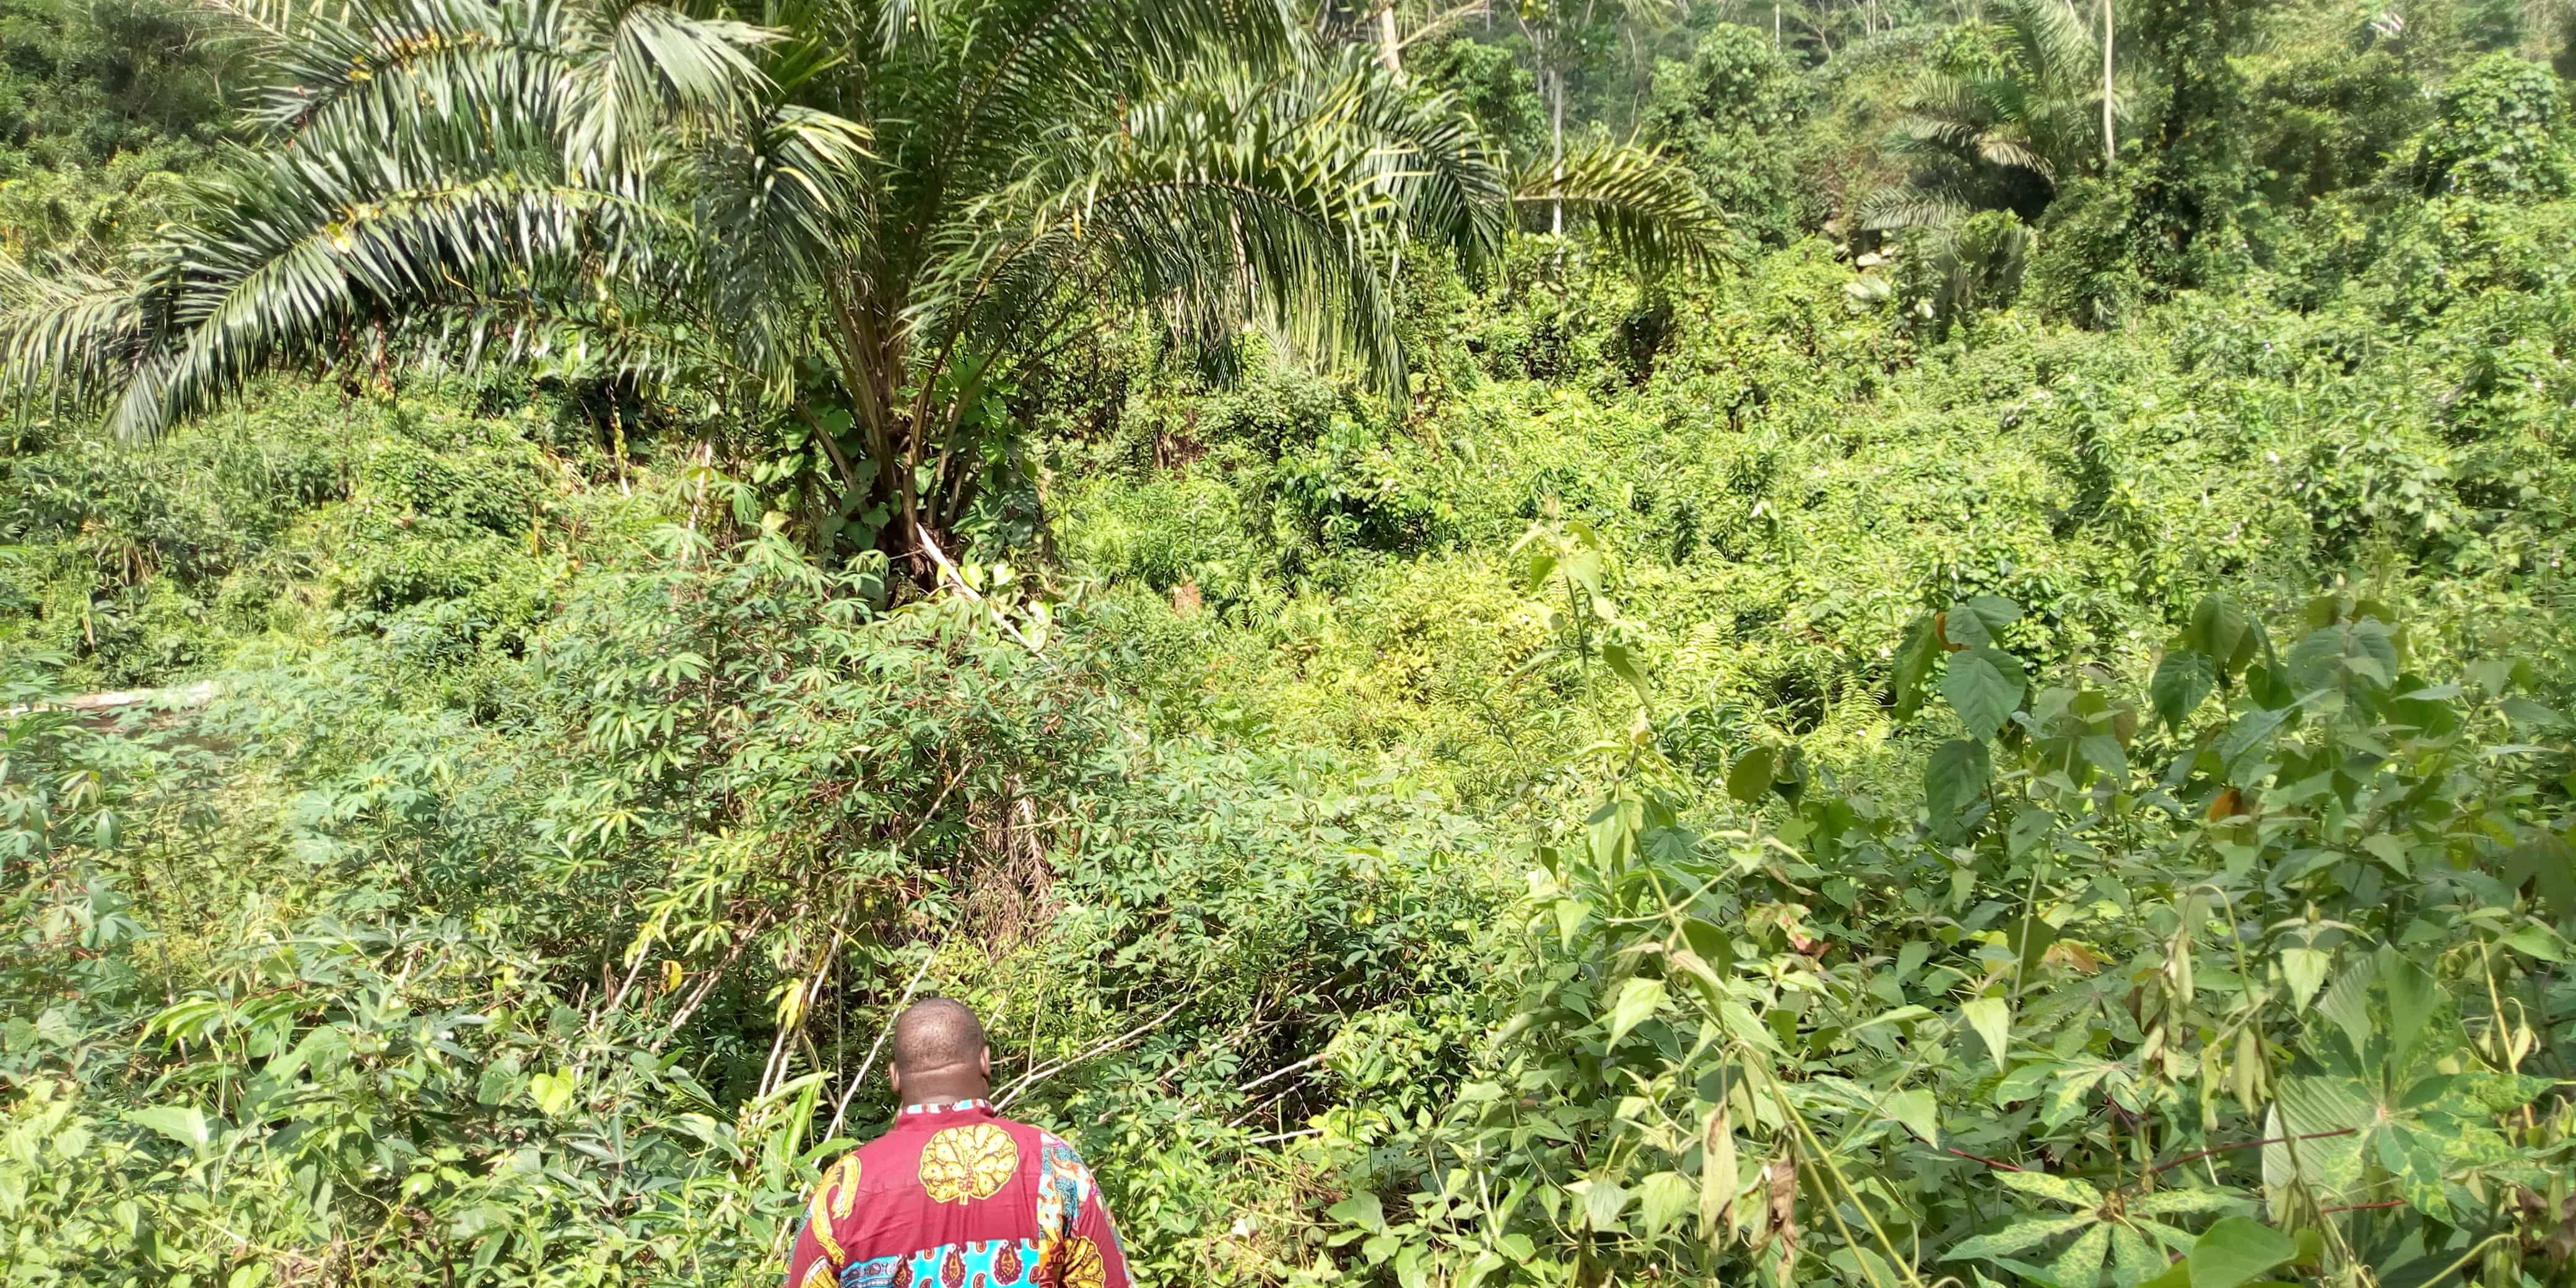 Land for sale at Yaoundé, Nsimalen, immobilier - 20000 m2 - 40 000 000 FCFA